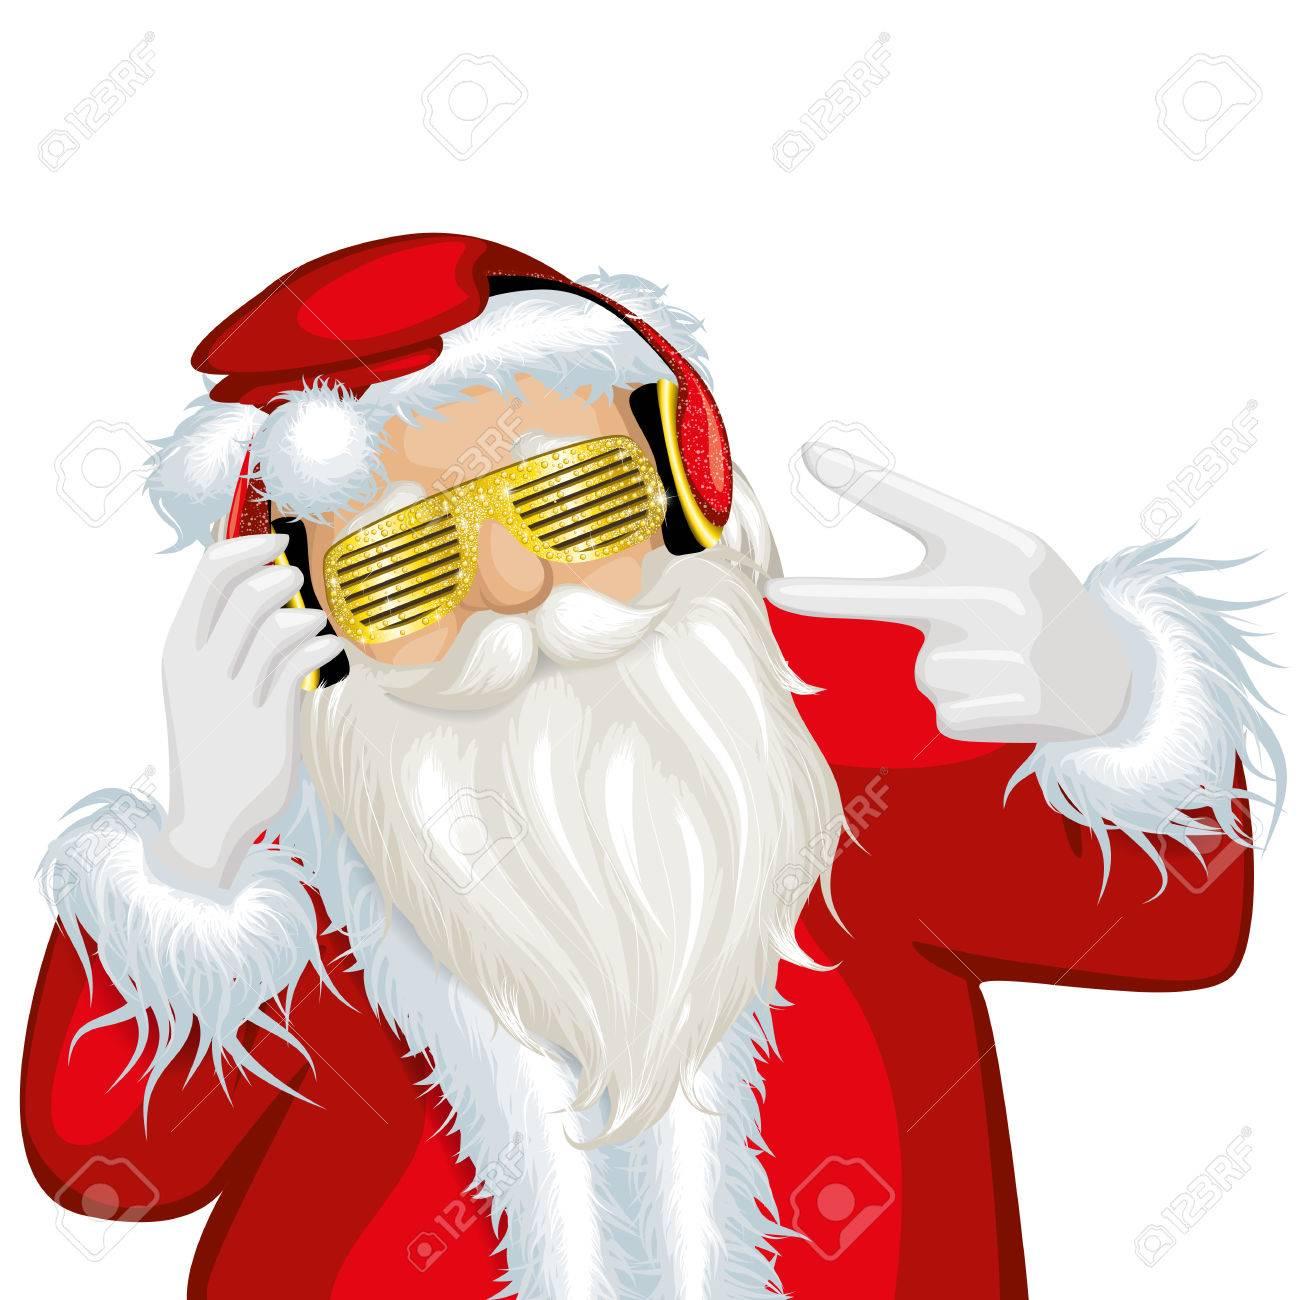 Swag Santa